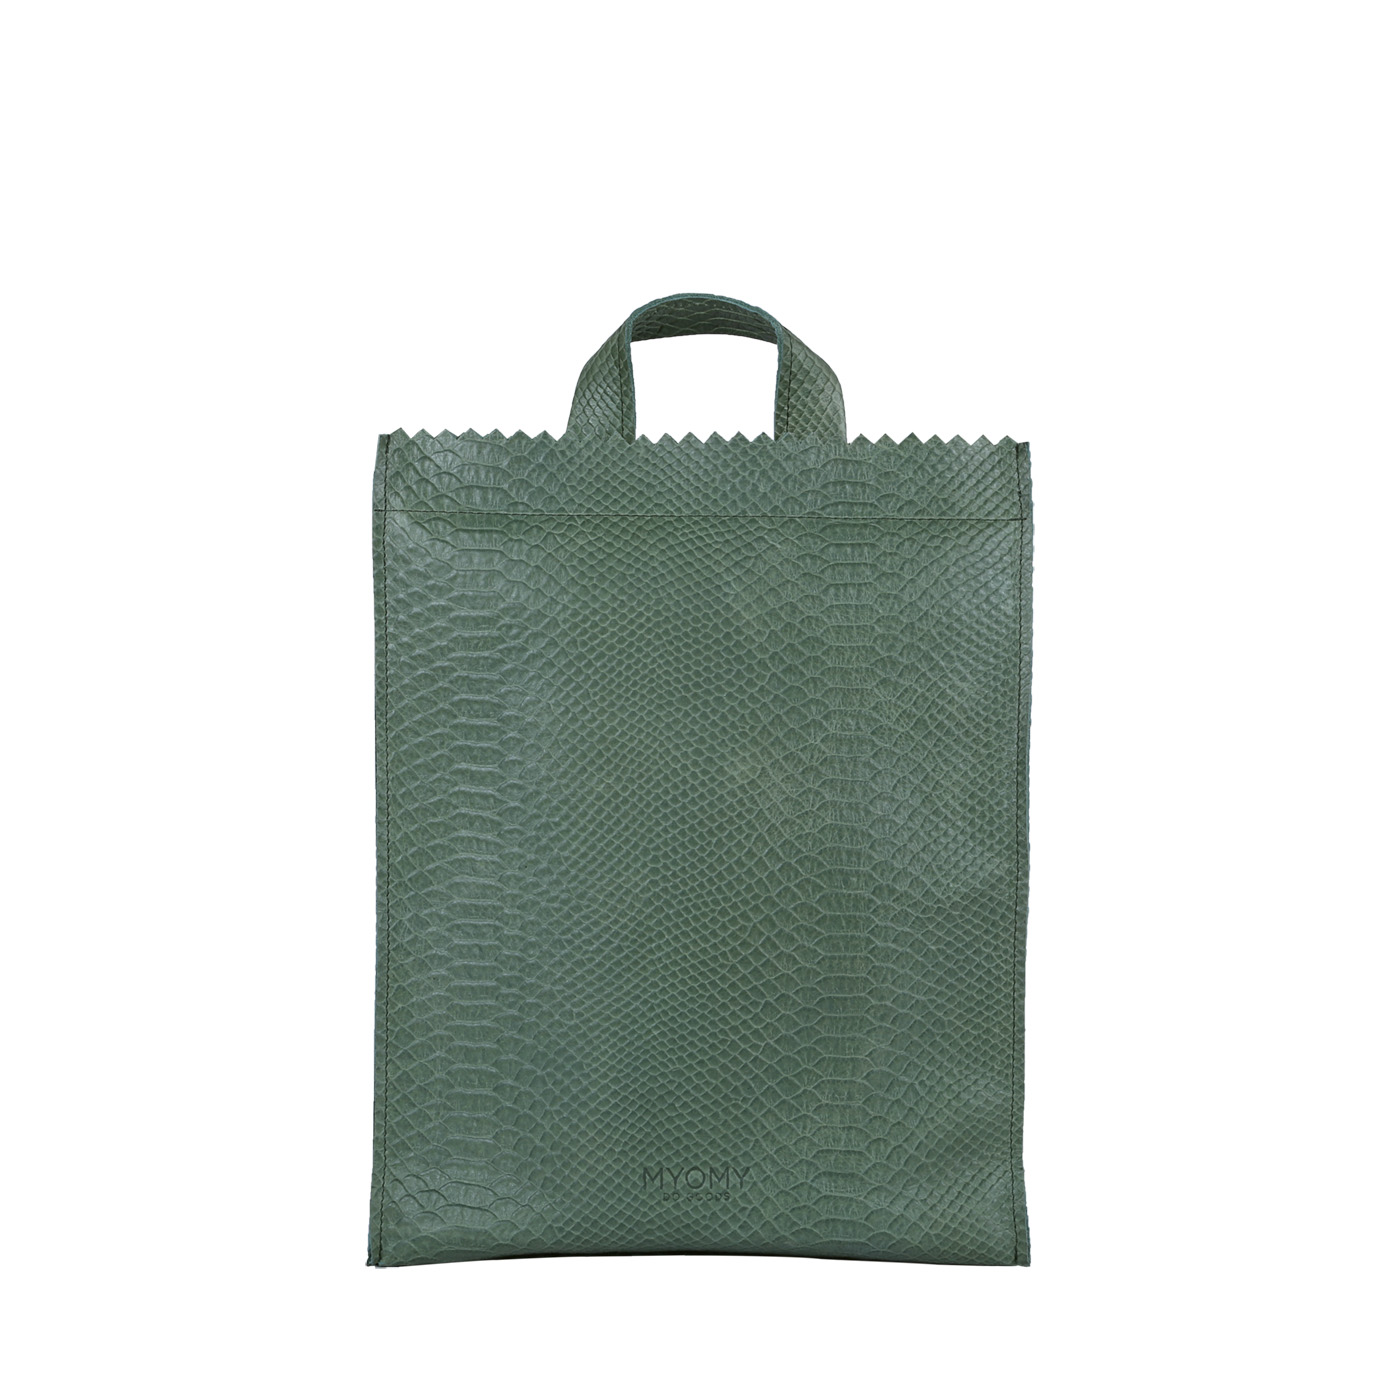 MY PAPER BAG Backbag medium - anaconda sea green